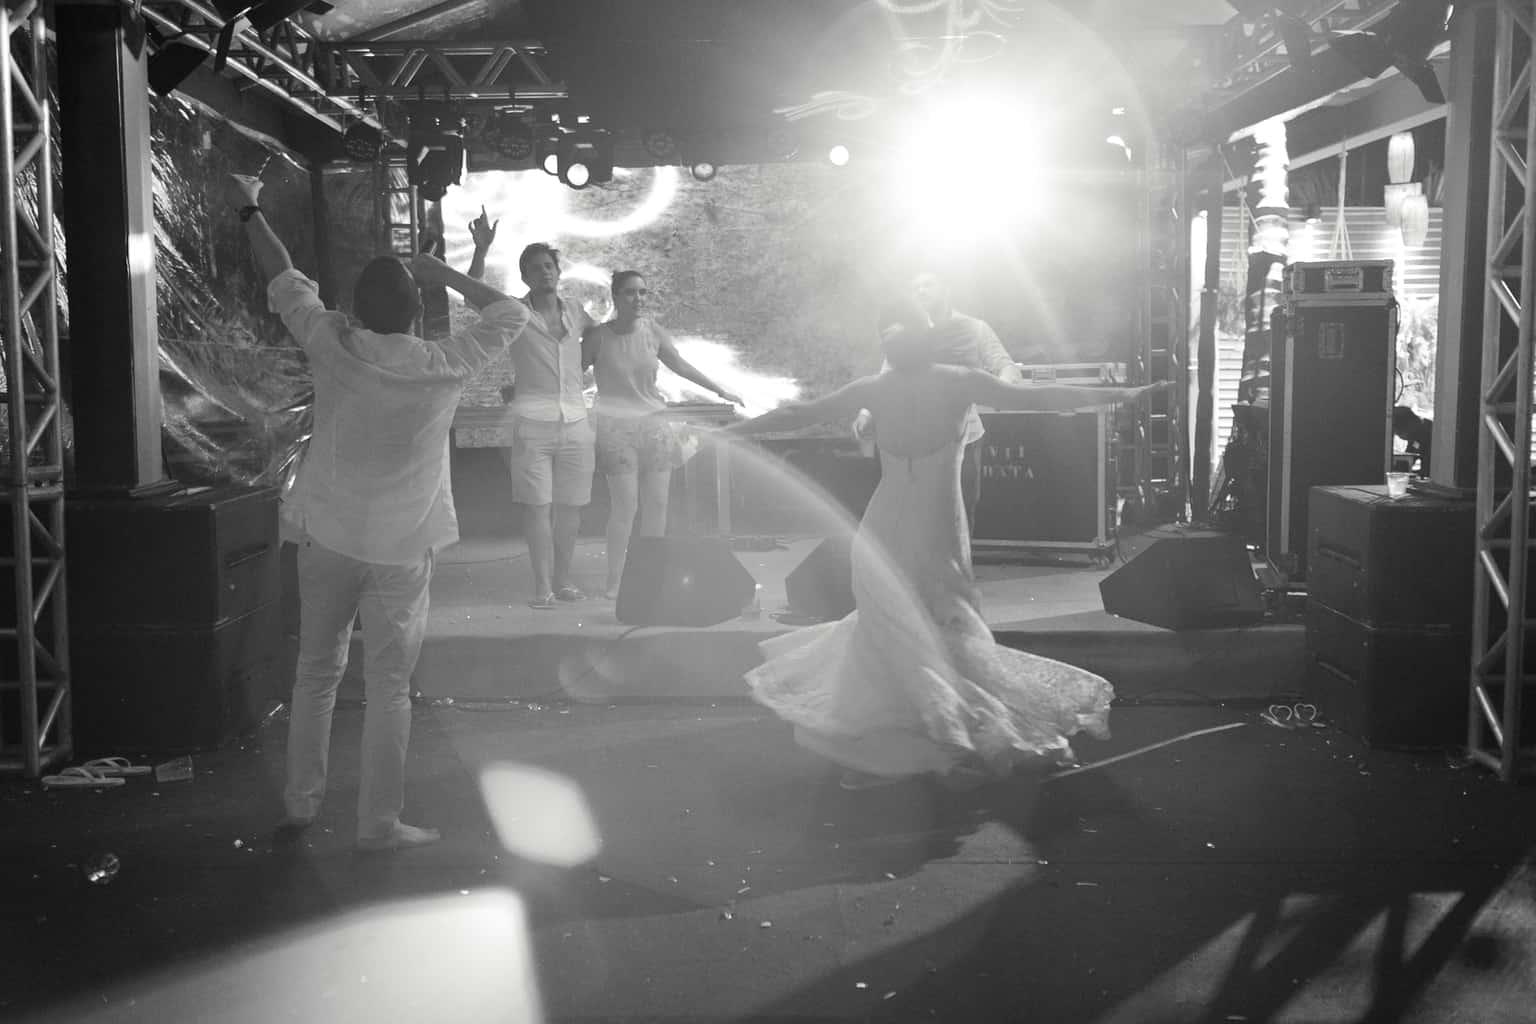 Casamento-Emanuelle-e-Alysson-Fotografia-Tadeu-Nanó-e-Luca-Antunes237